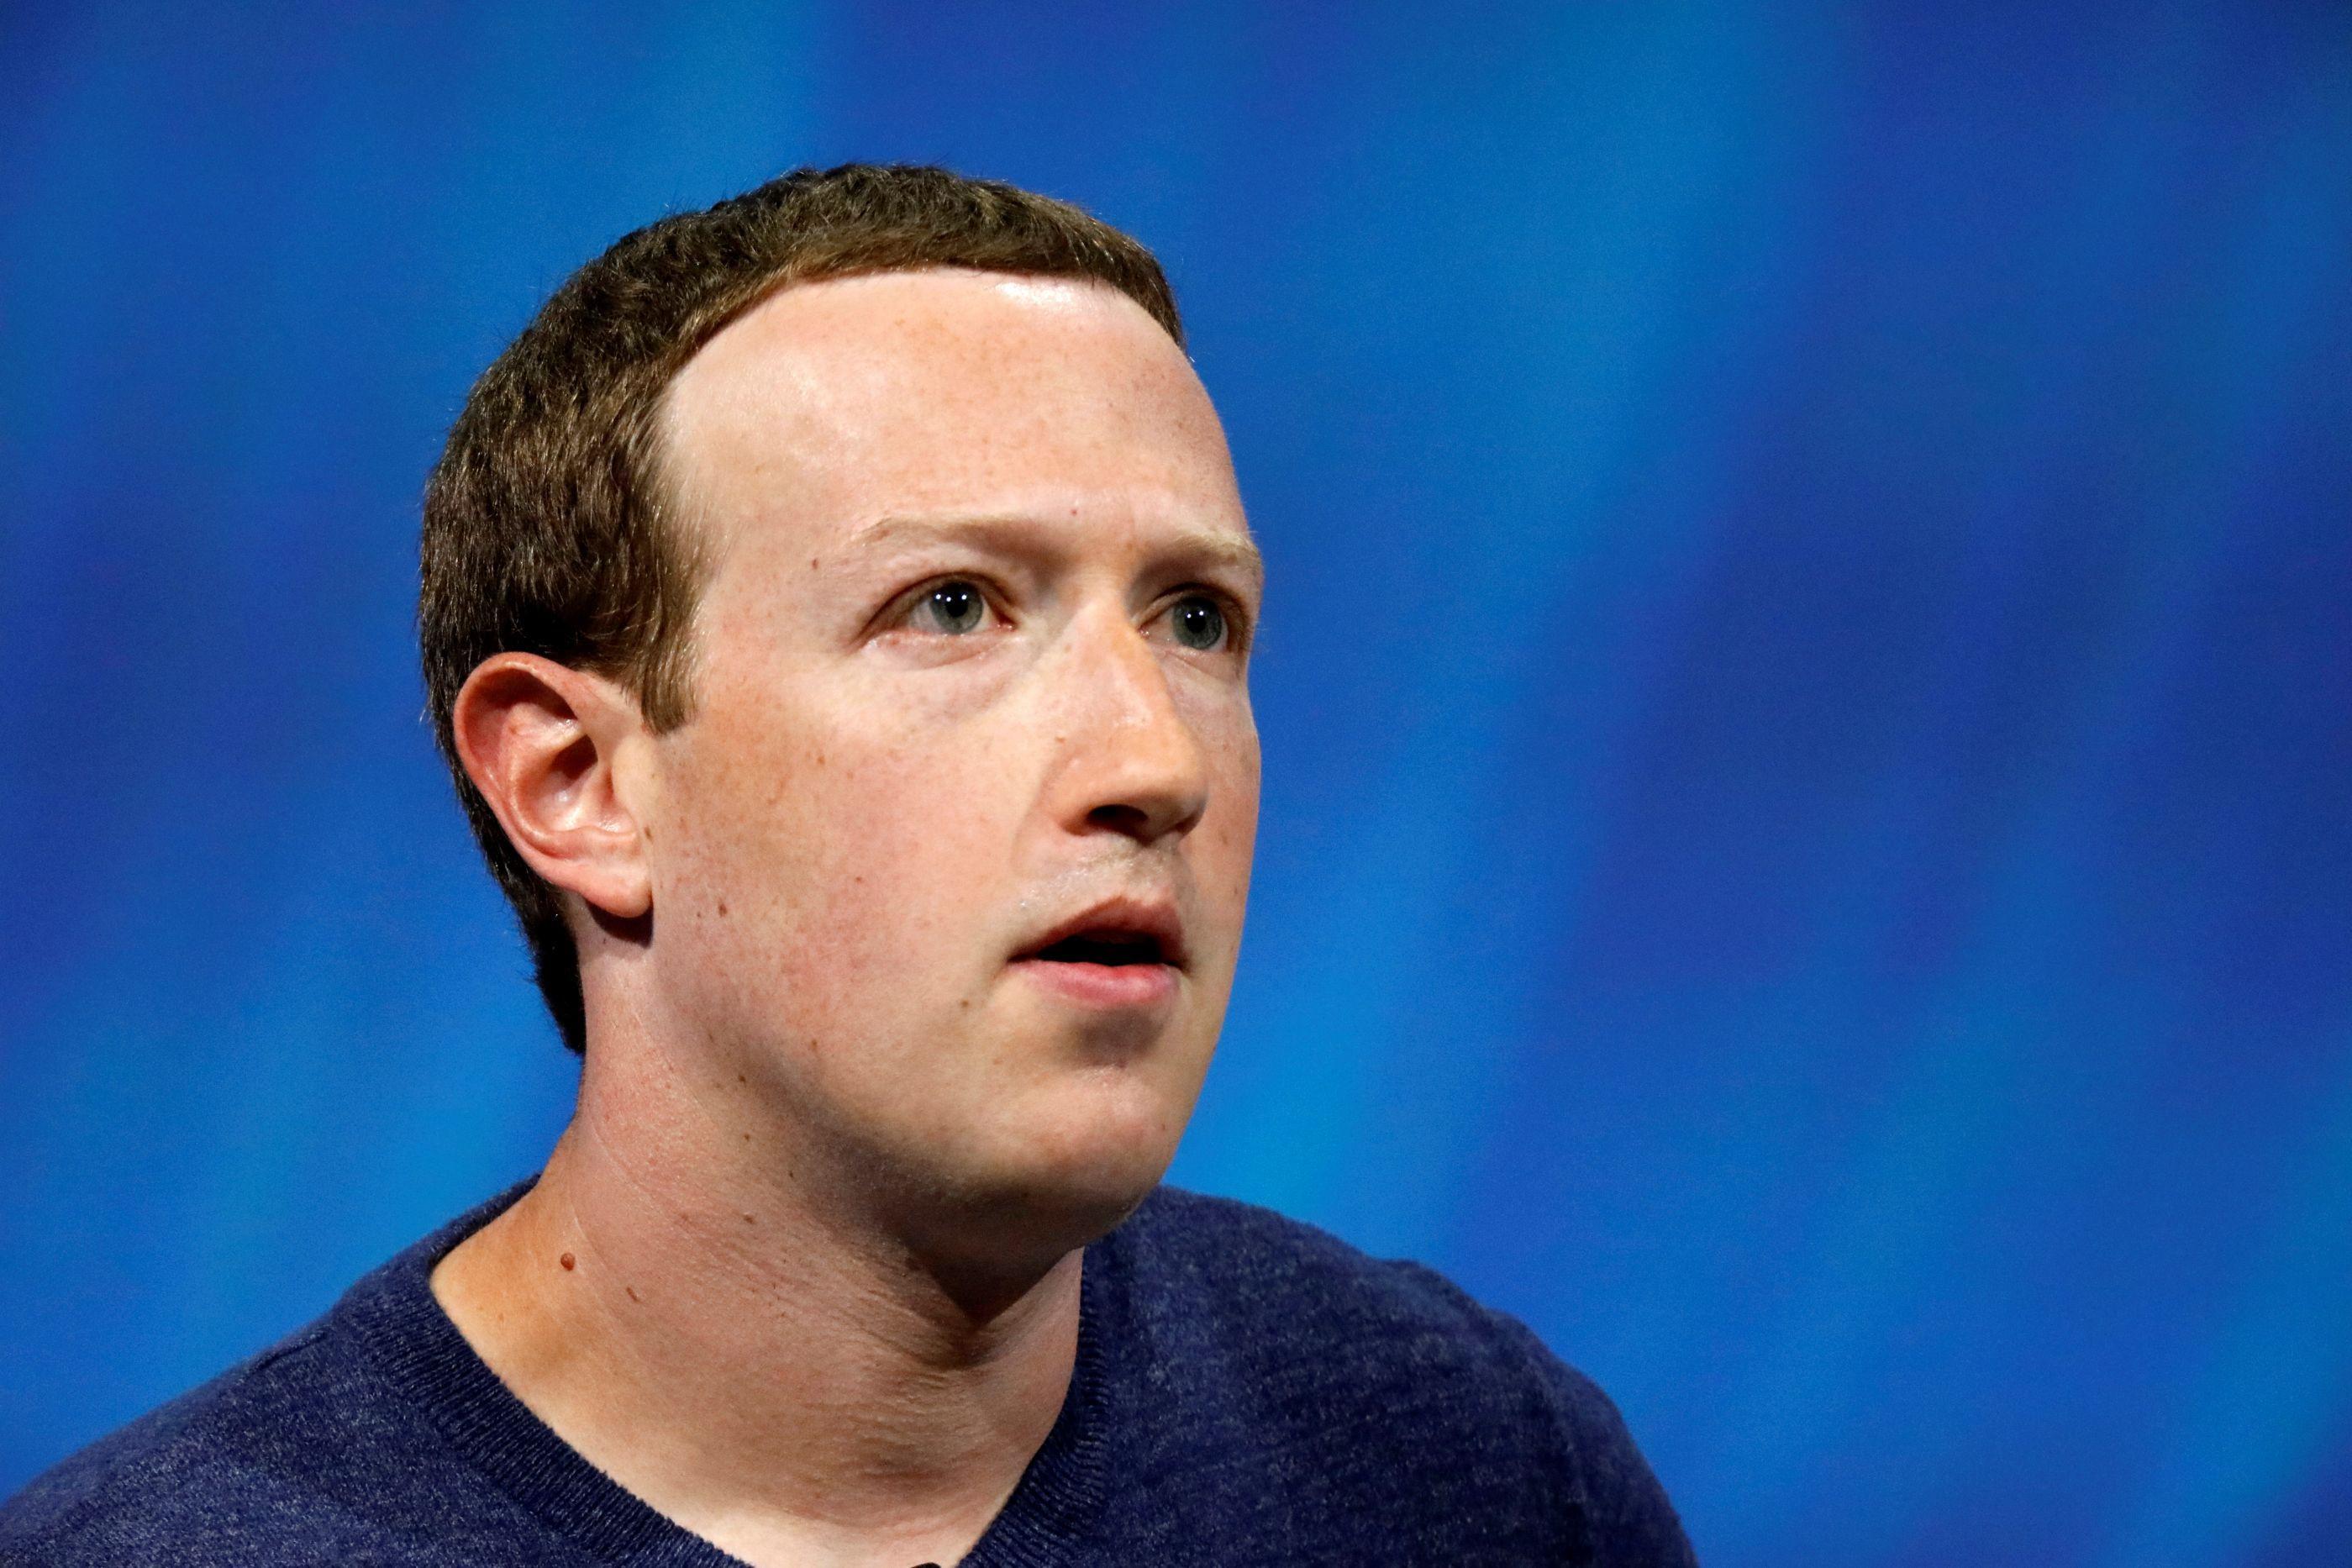 Facebook recebe multa de 10 milhões de euros